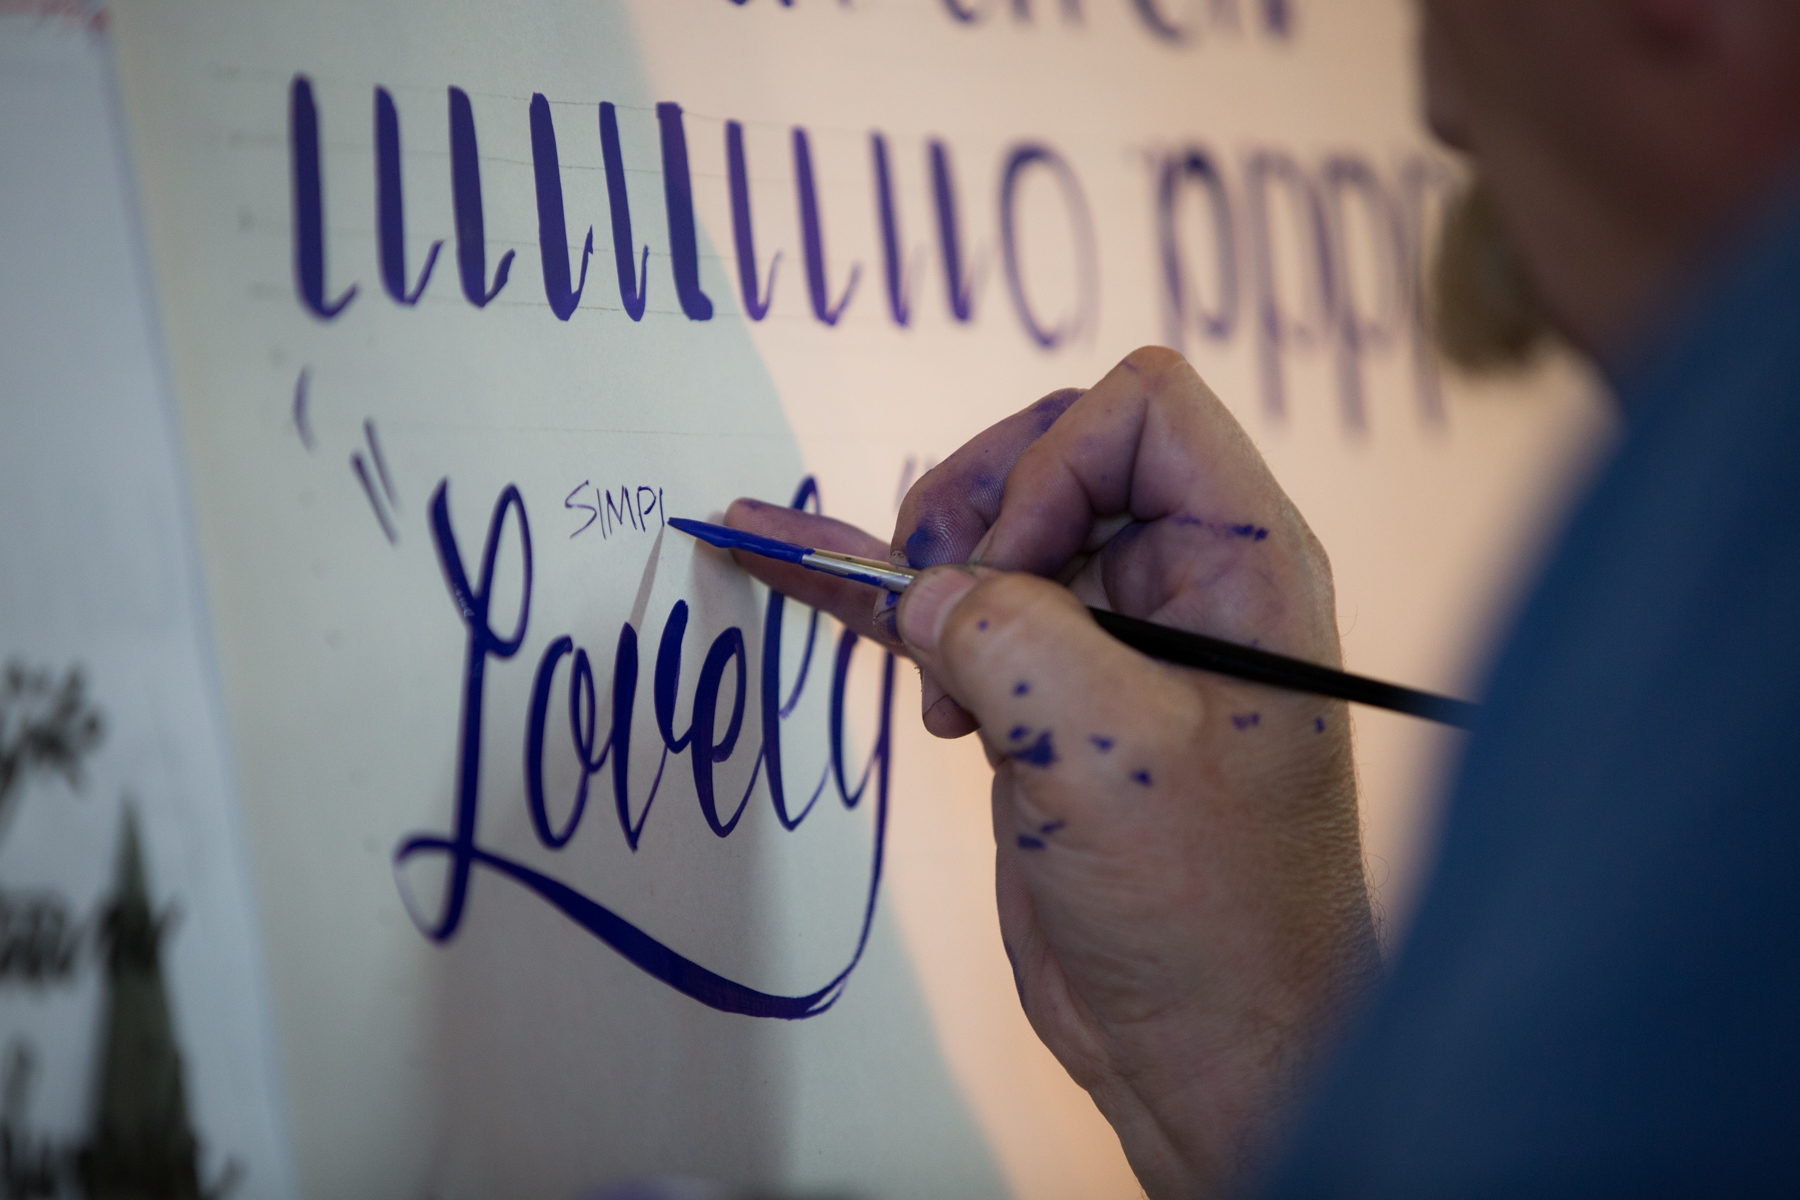 Mike-Meyer-Signwriting-Workshop-13.jpg